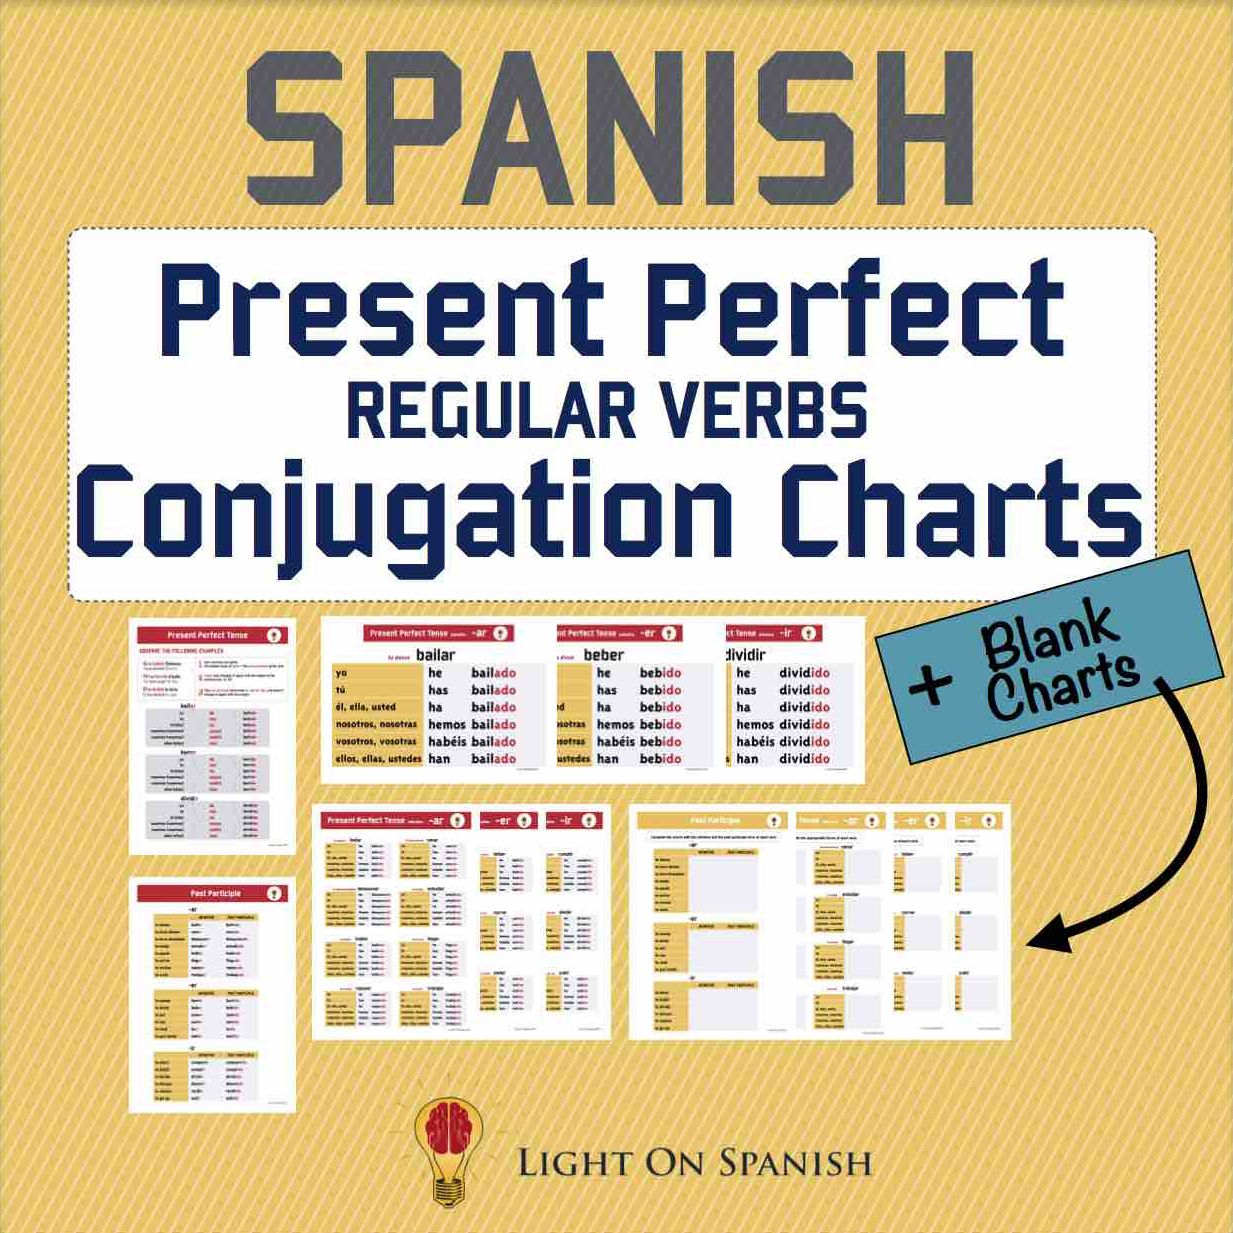 Spanish Present Perfect Regular Verbs Conjugation Charts